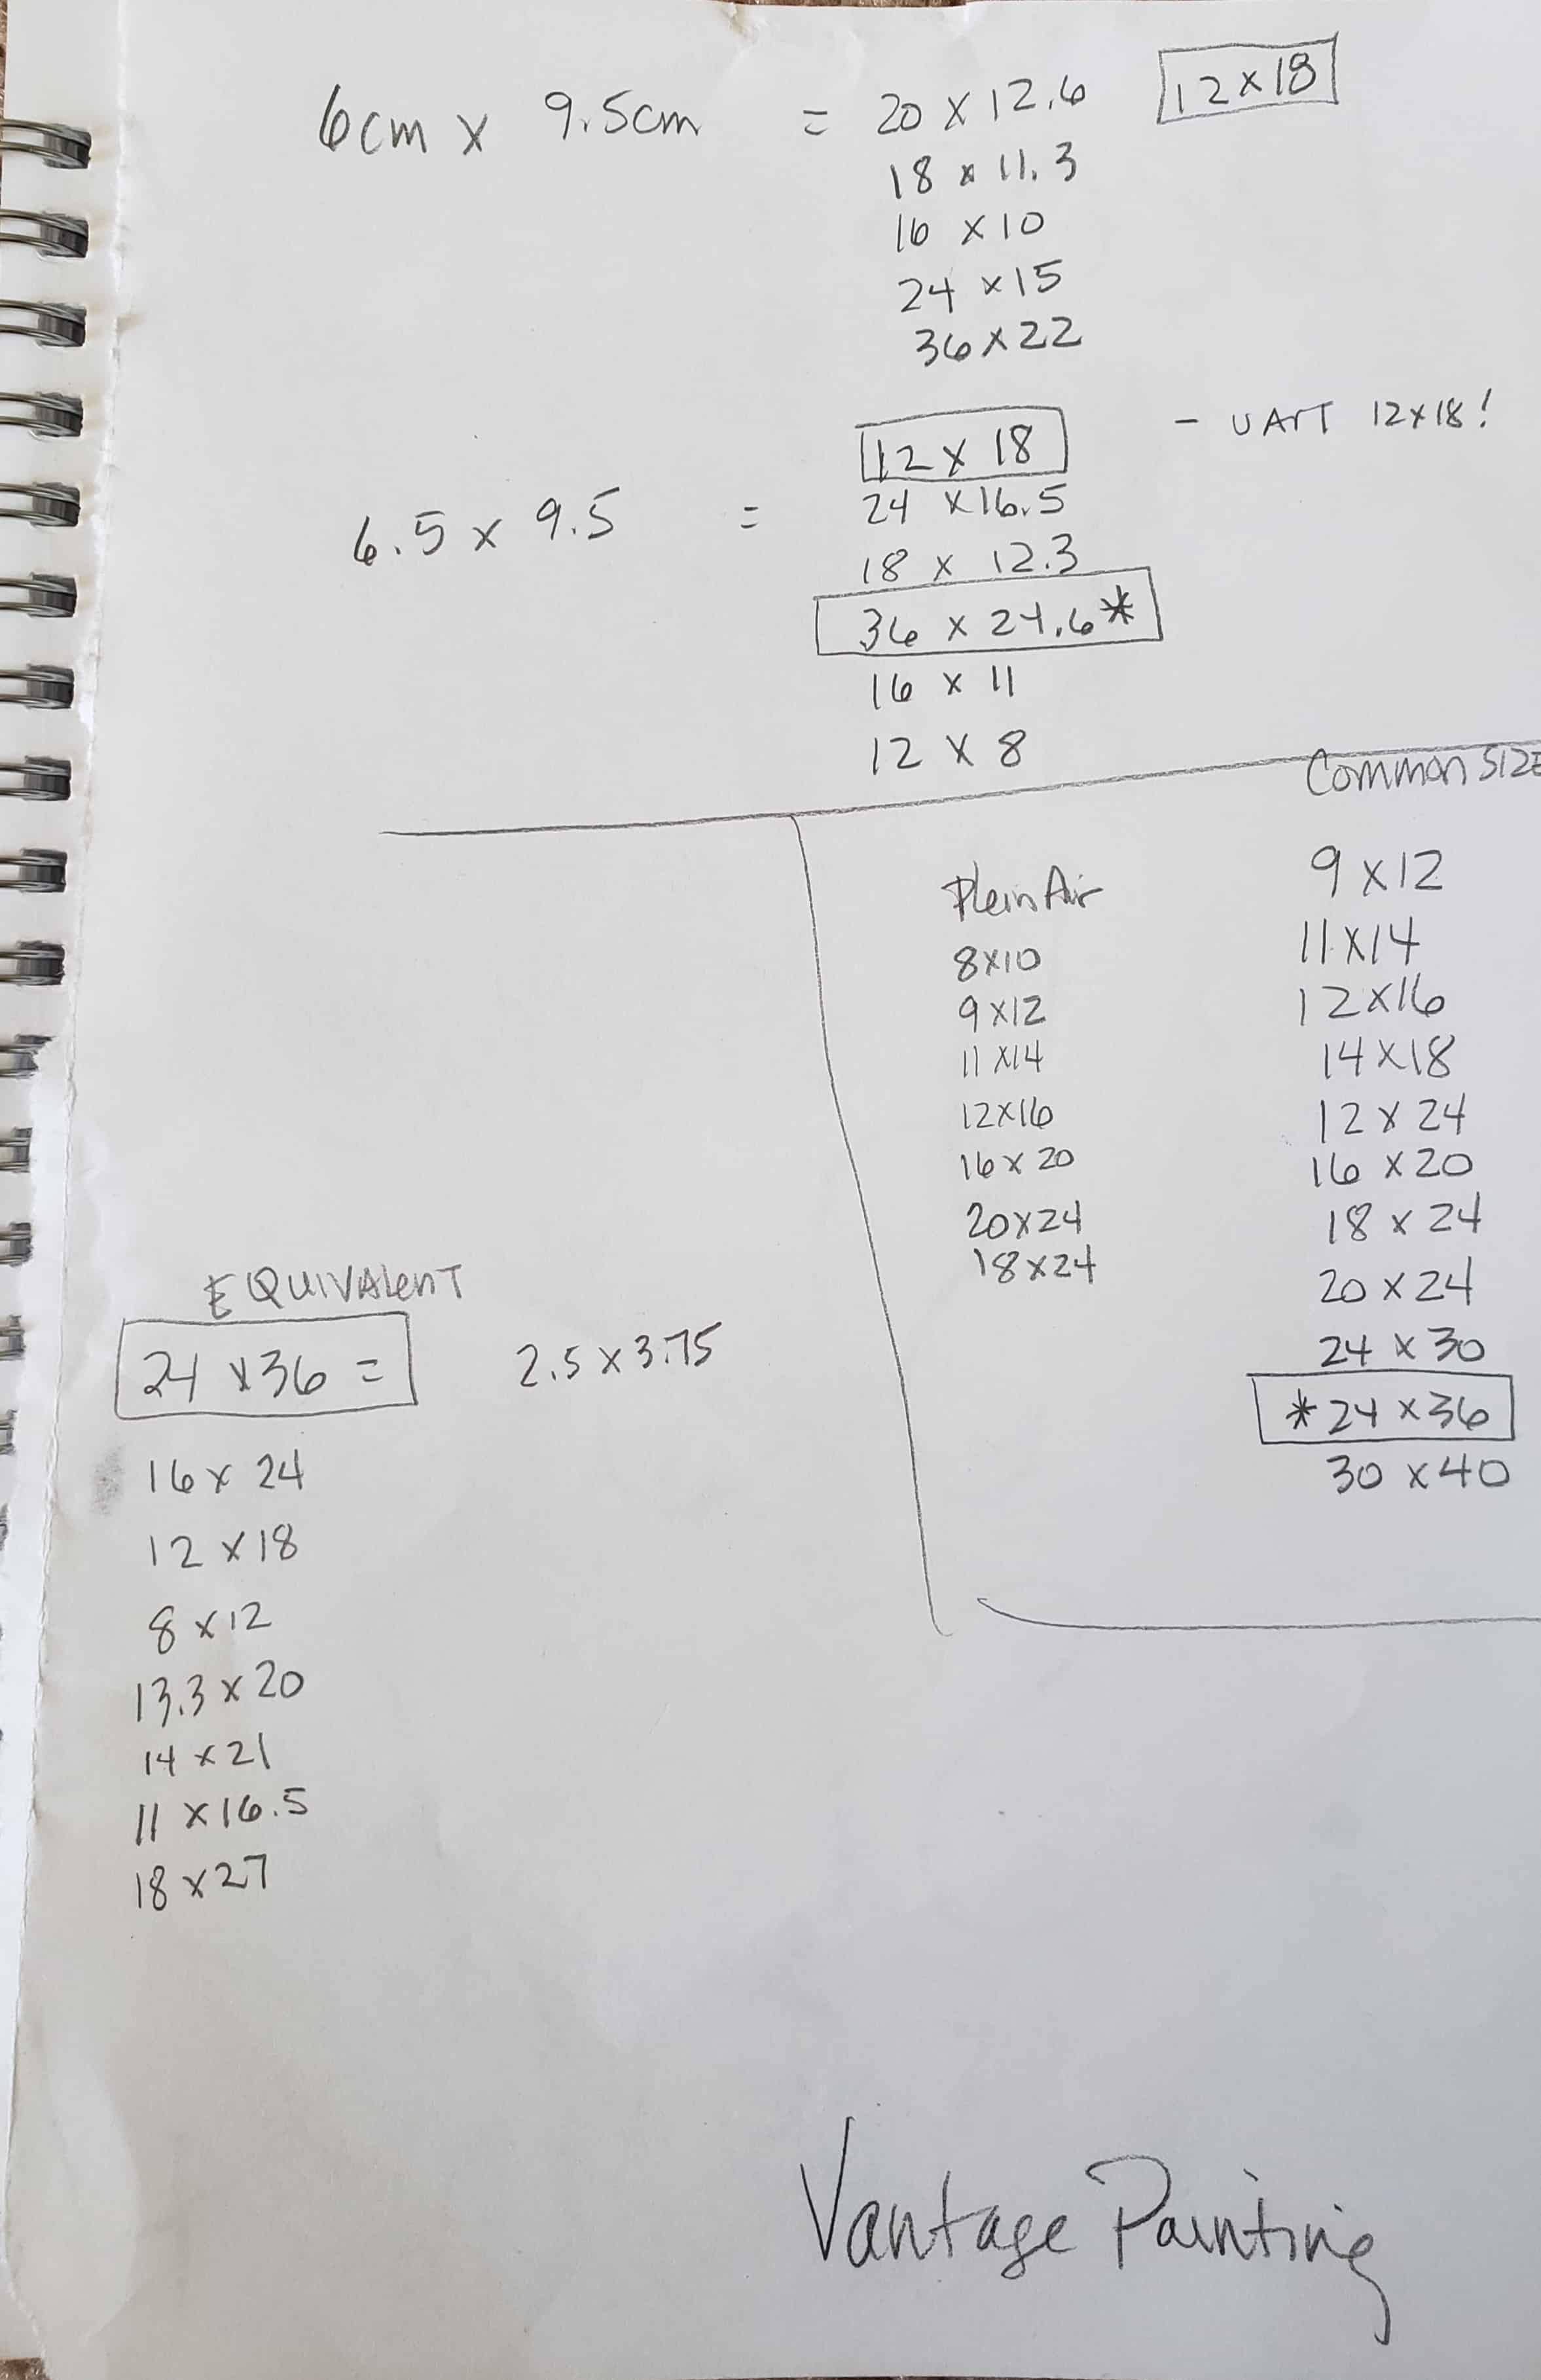 framing precalculations